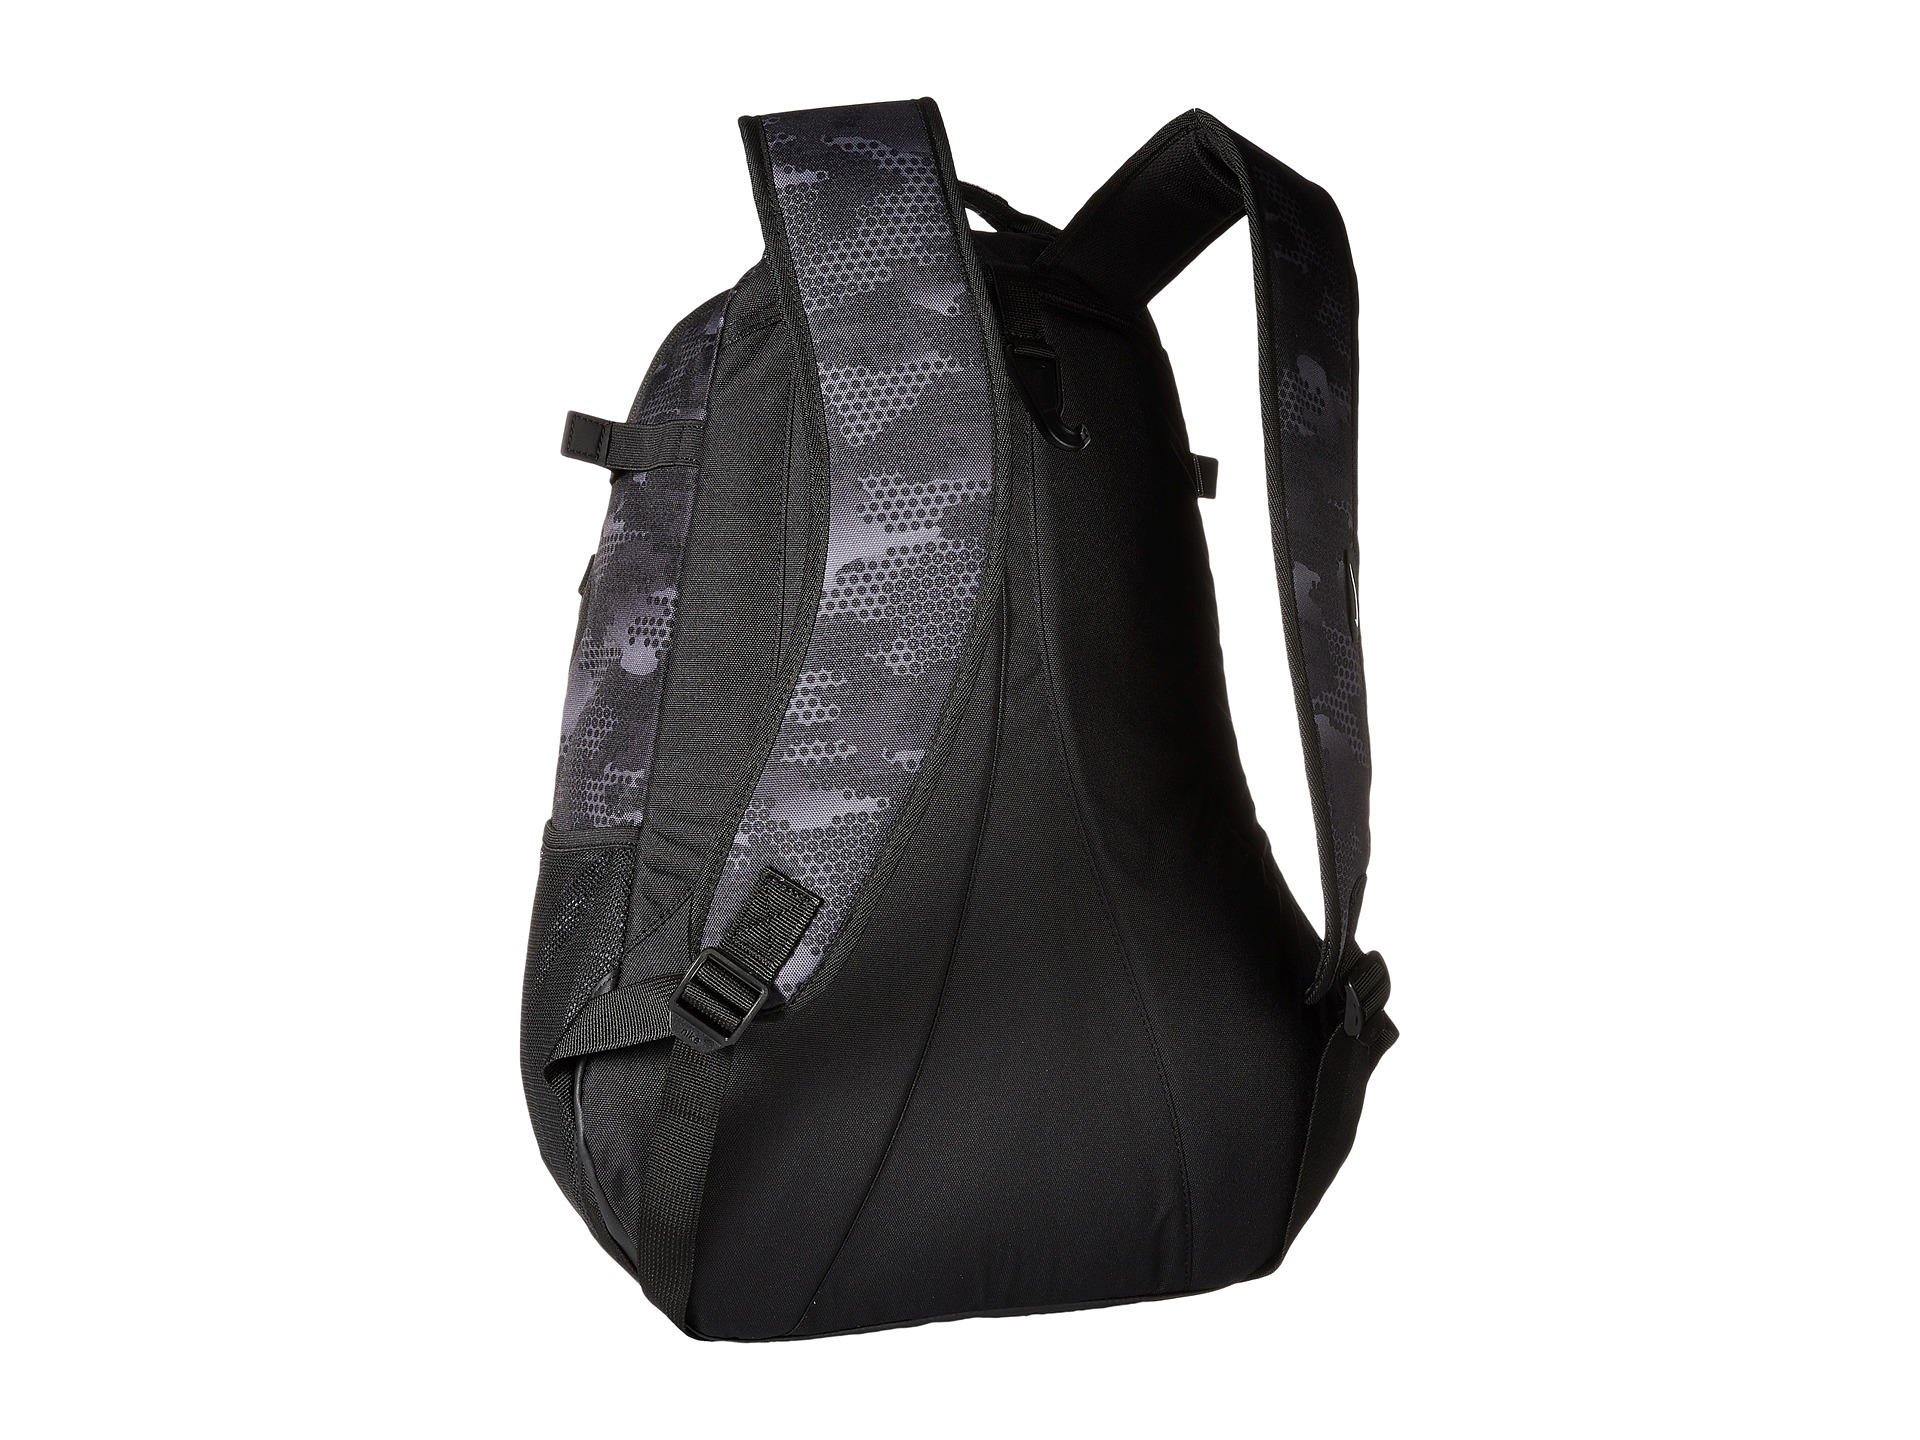 Nike Vapor Select Bat Backpack Graphic on PopScreen 48828f79c72f9